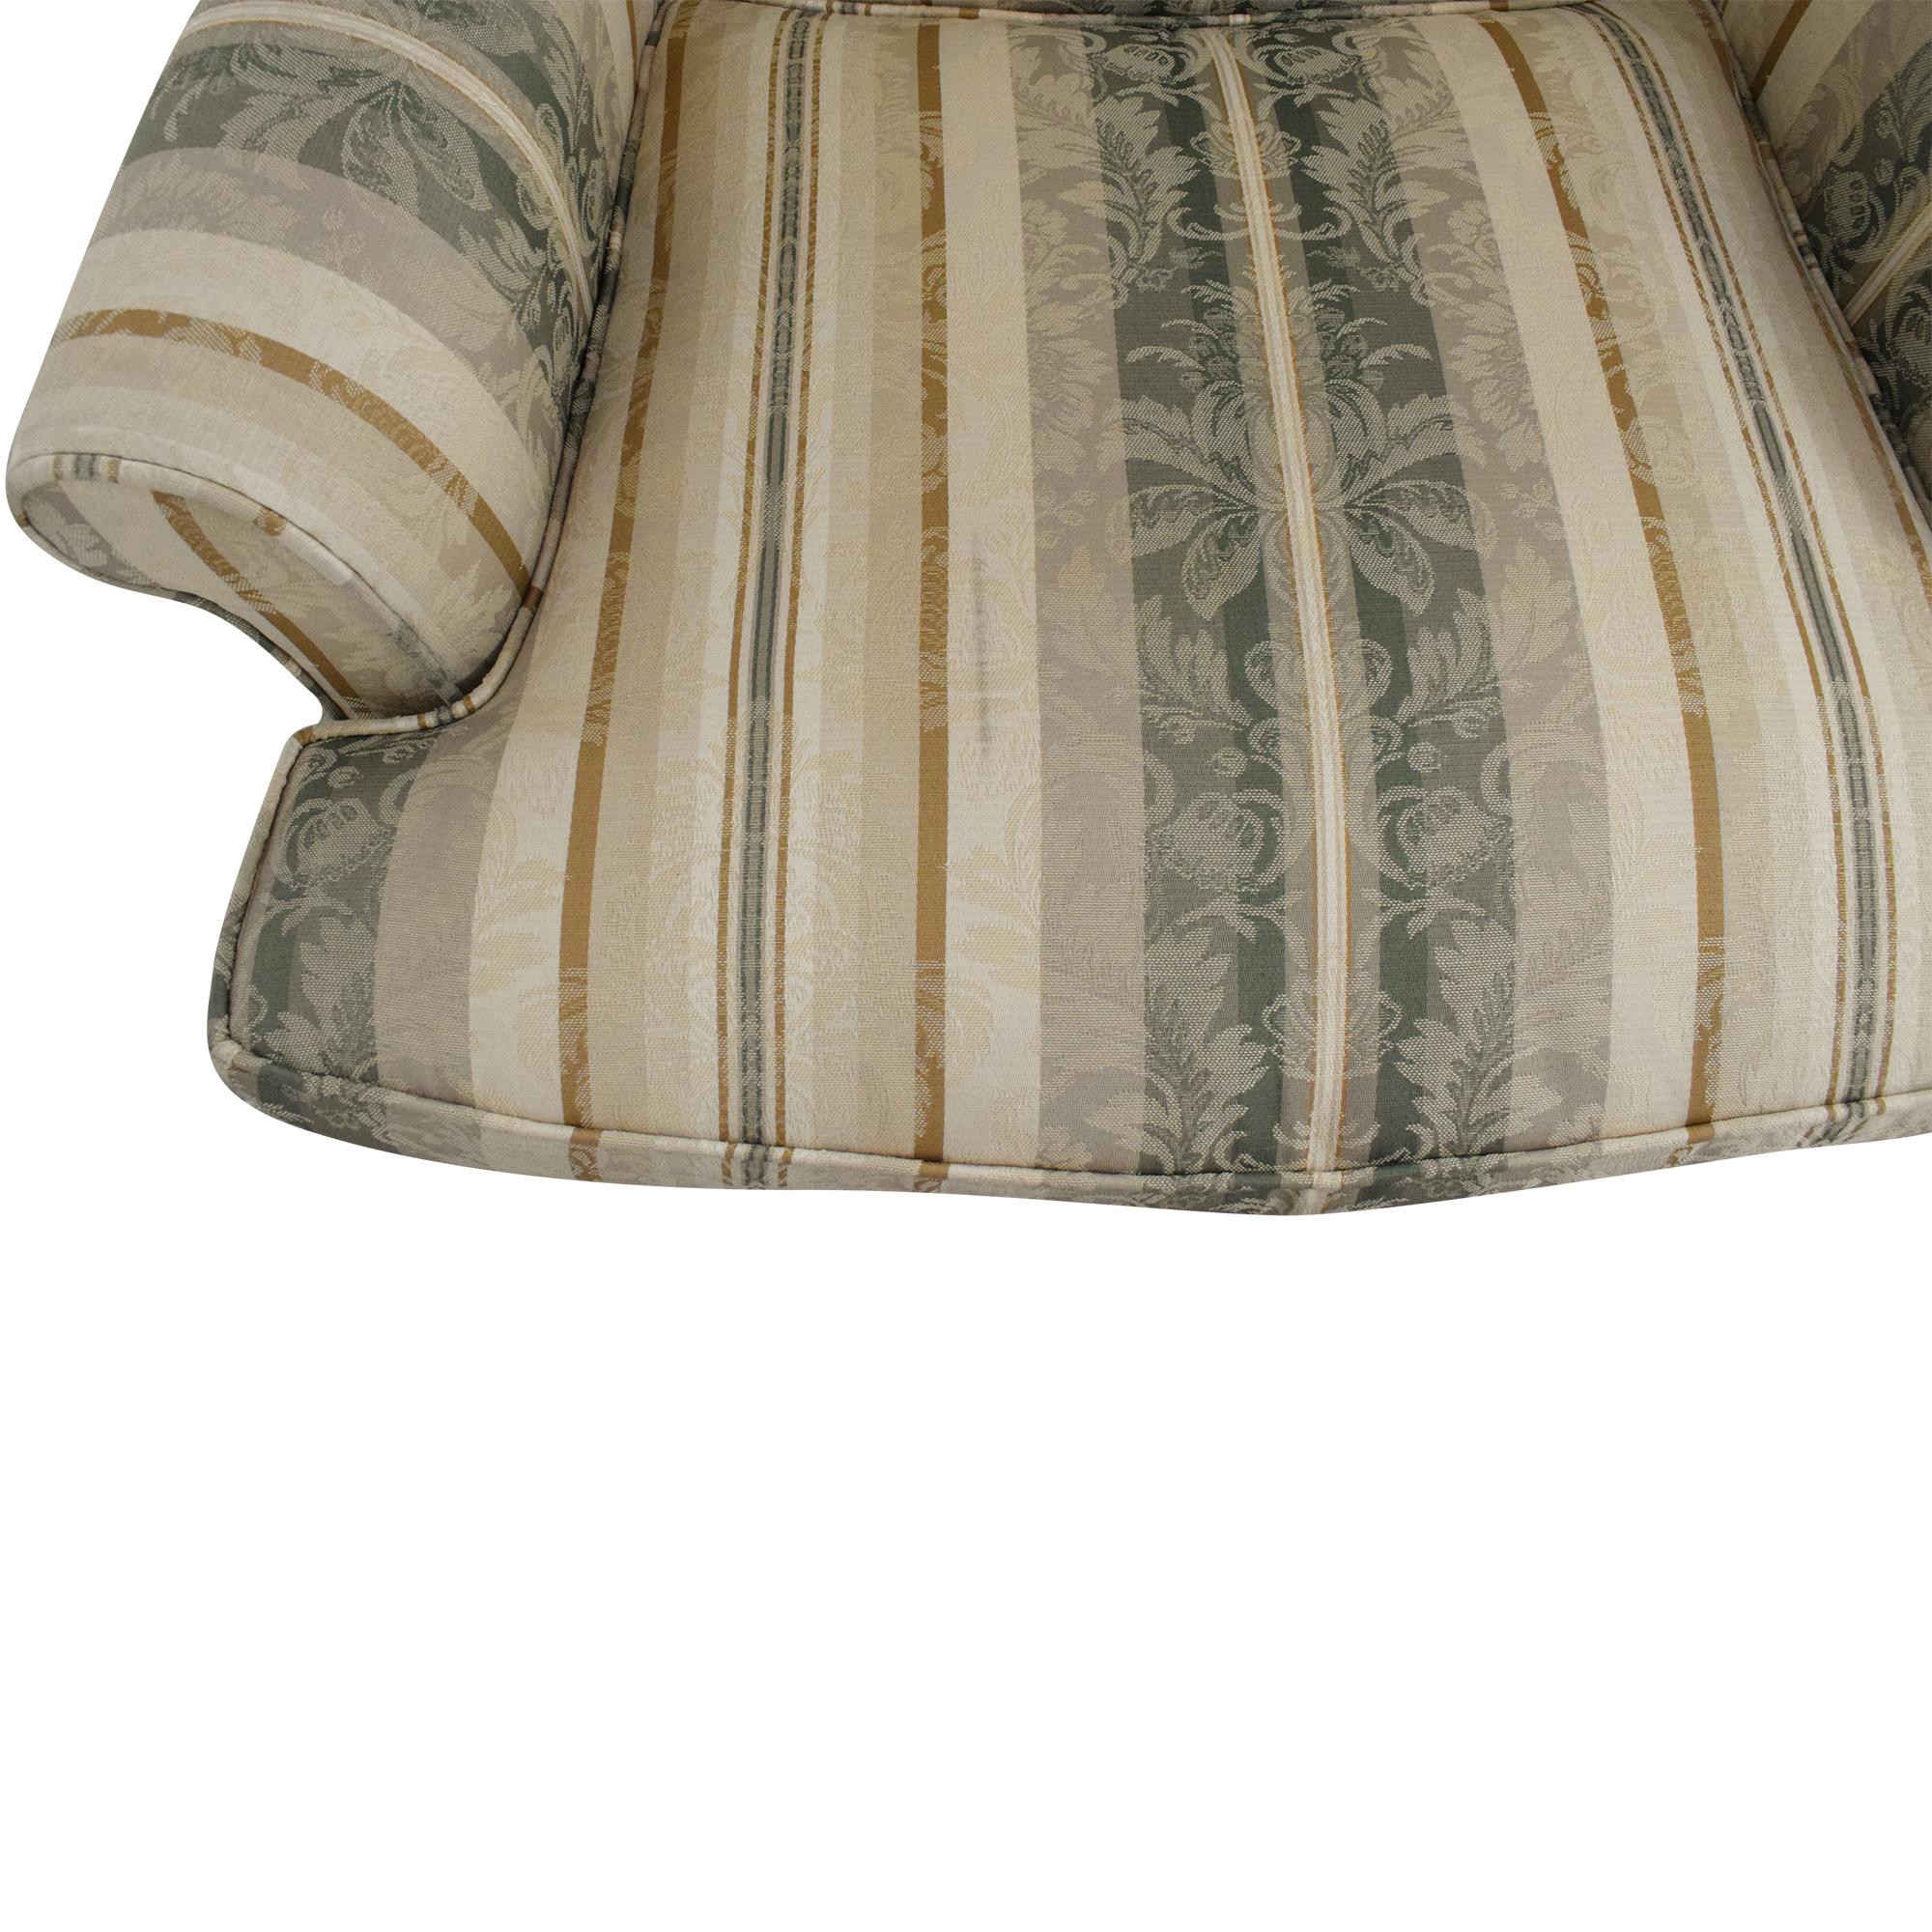 Woodmark Woodmark Wing Back Accent Chair multi